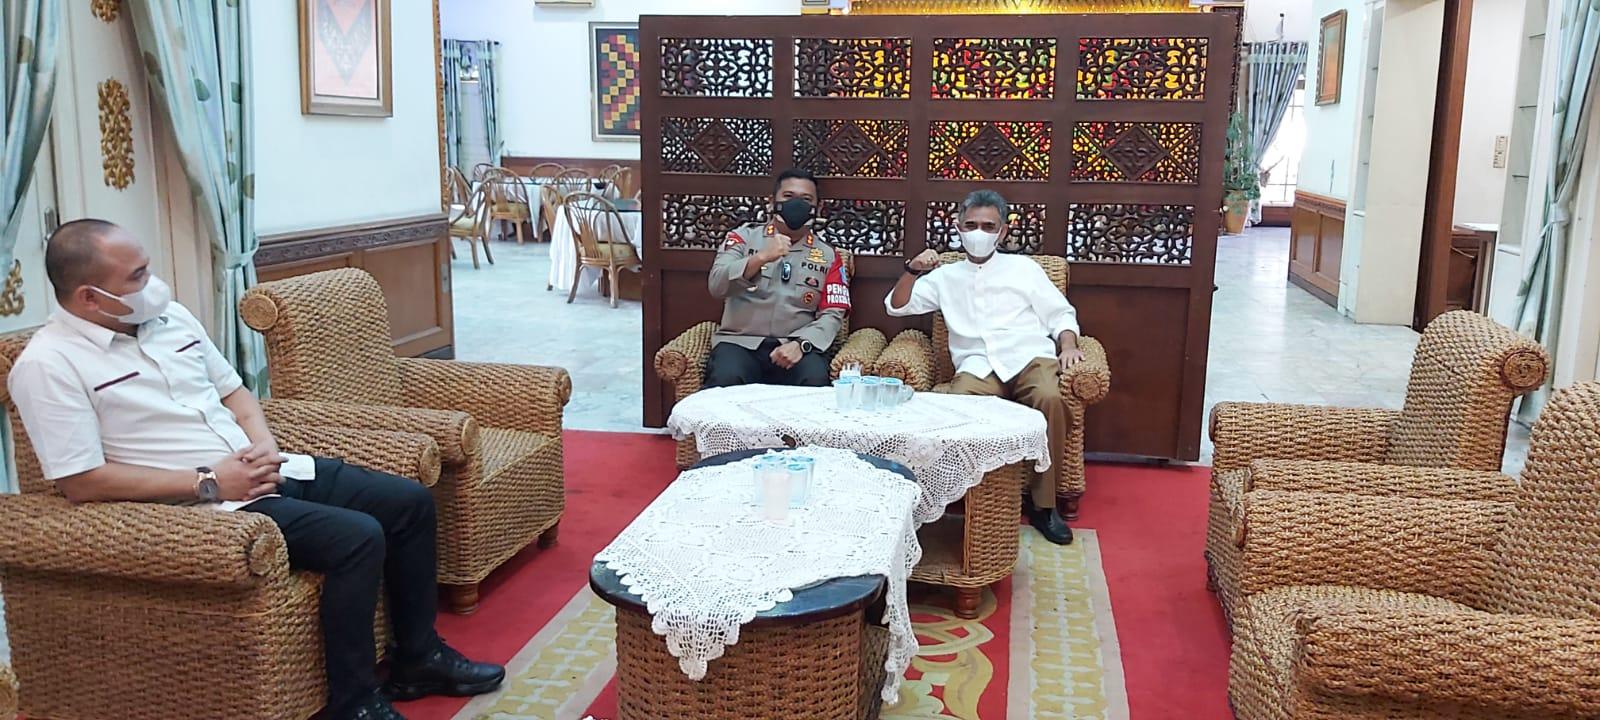 Rajut Tali Silaturahmi, Kapolres Aceh Utara AKBP Riza Faisal berkunjung ke pendopo Aceh Utara